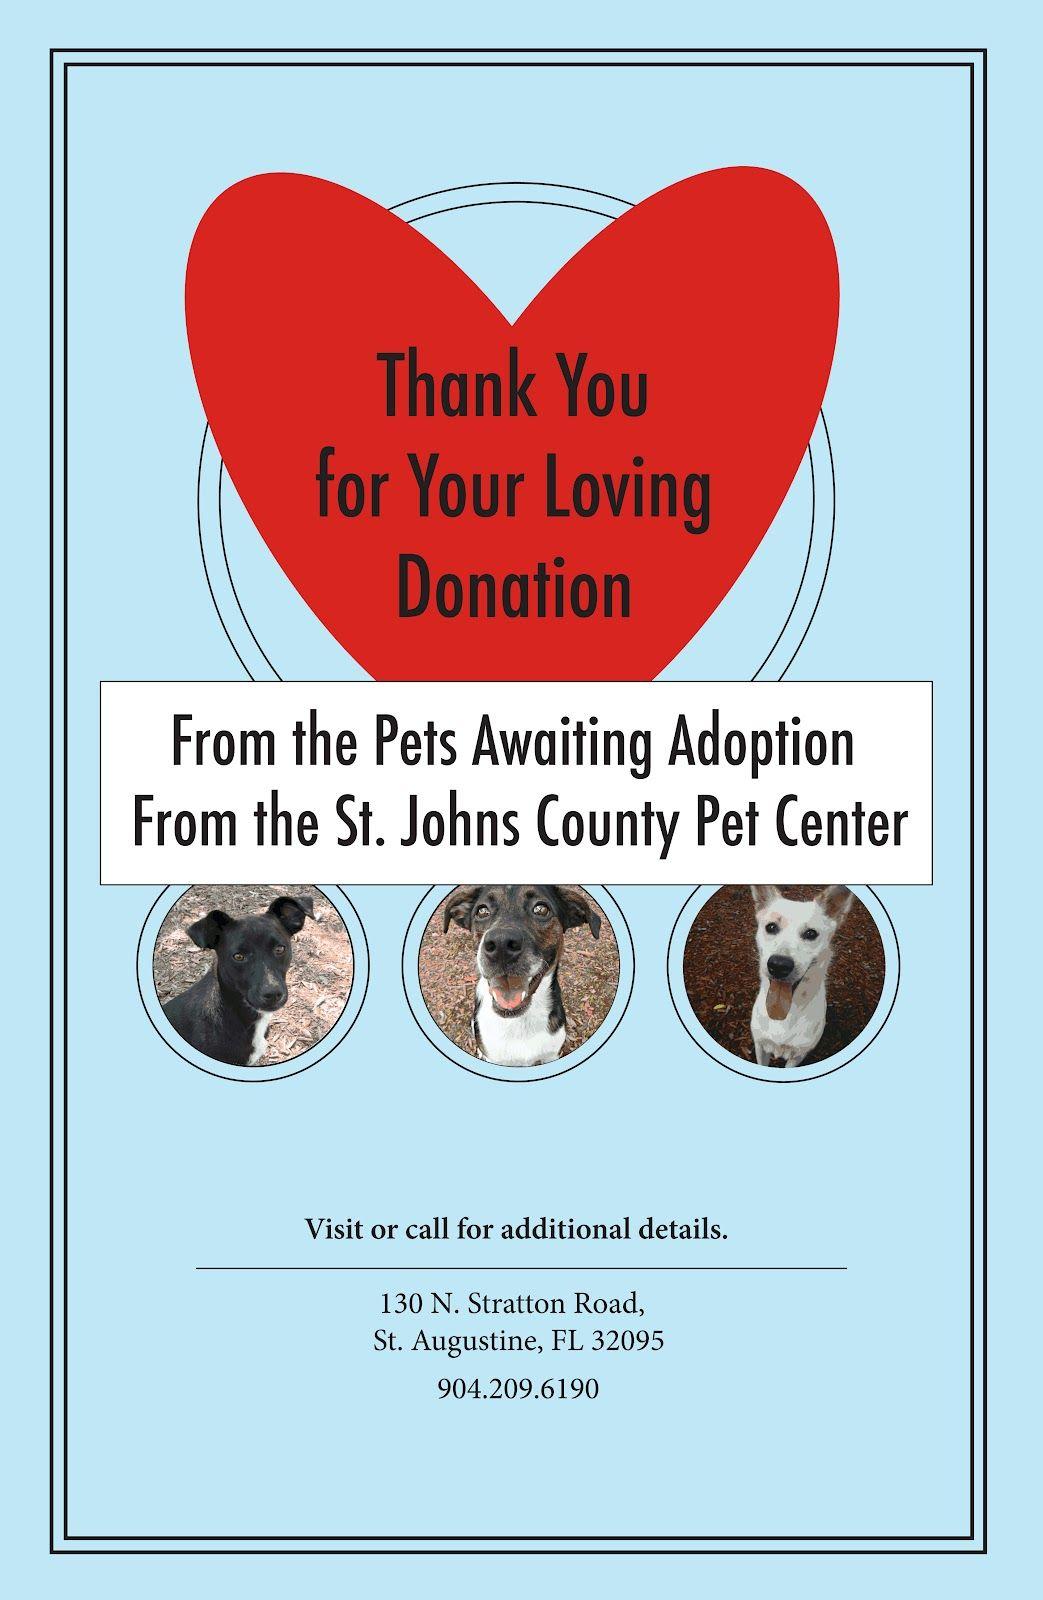 Pet Adoption Donations Poster Design By Jordan Brantley Pet Adoption Pets Adoption